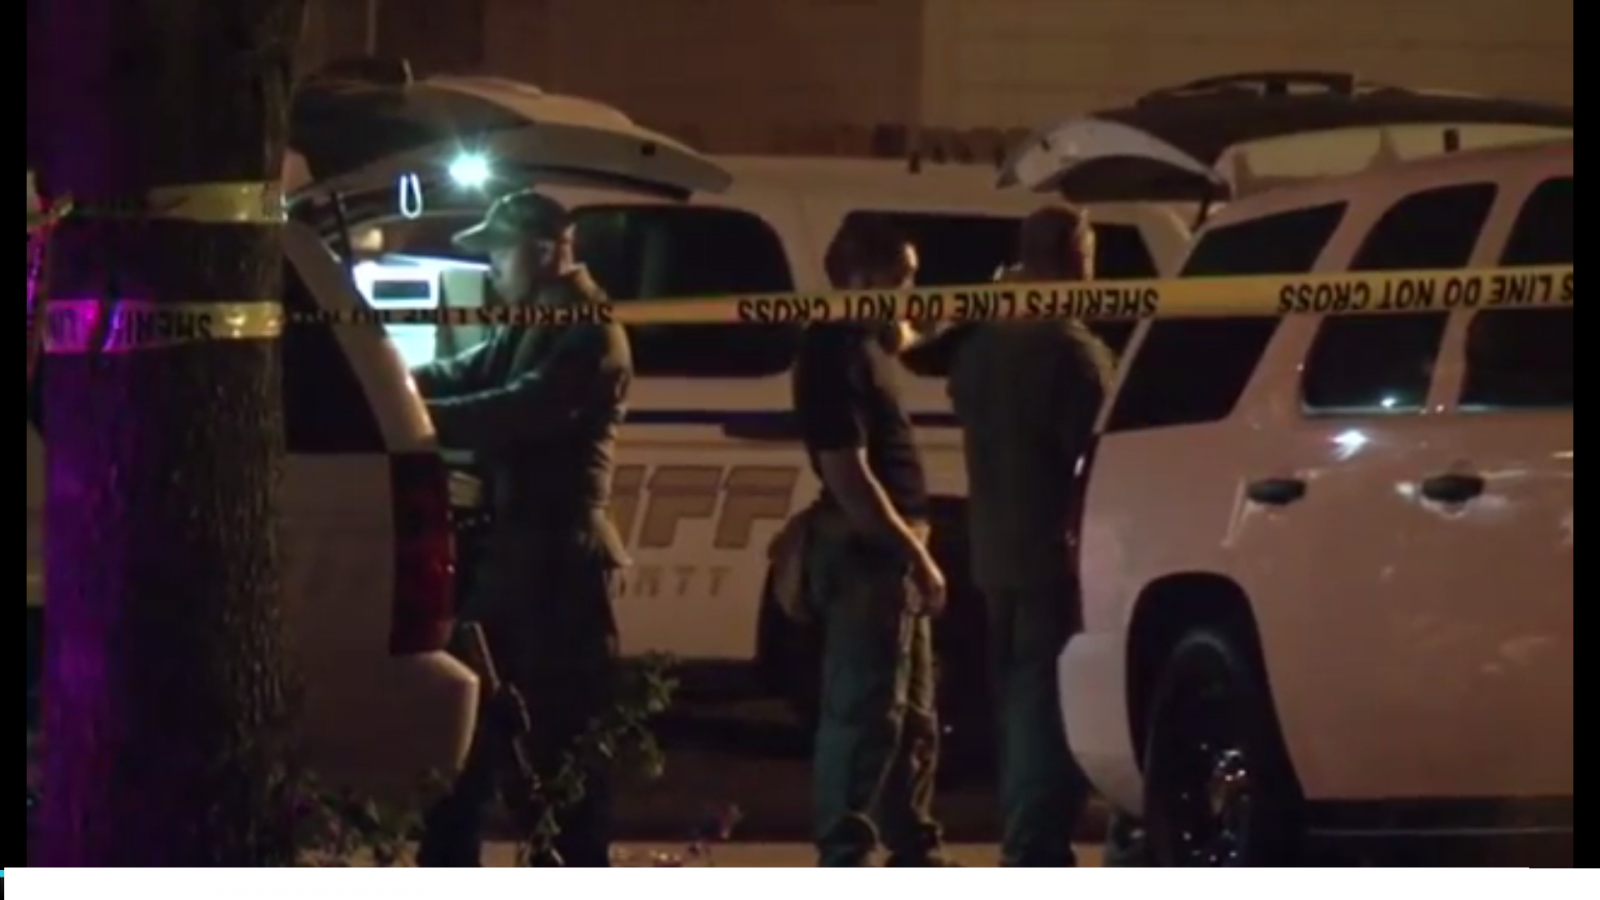 Police outside the Houston home